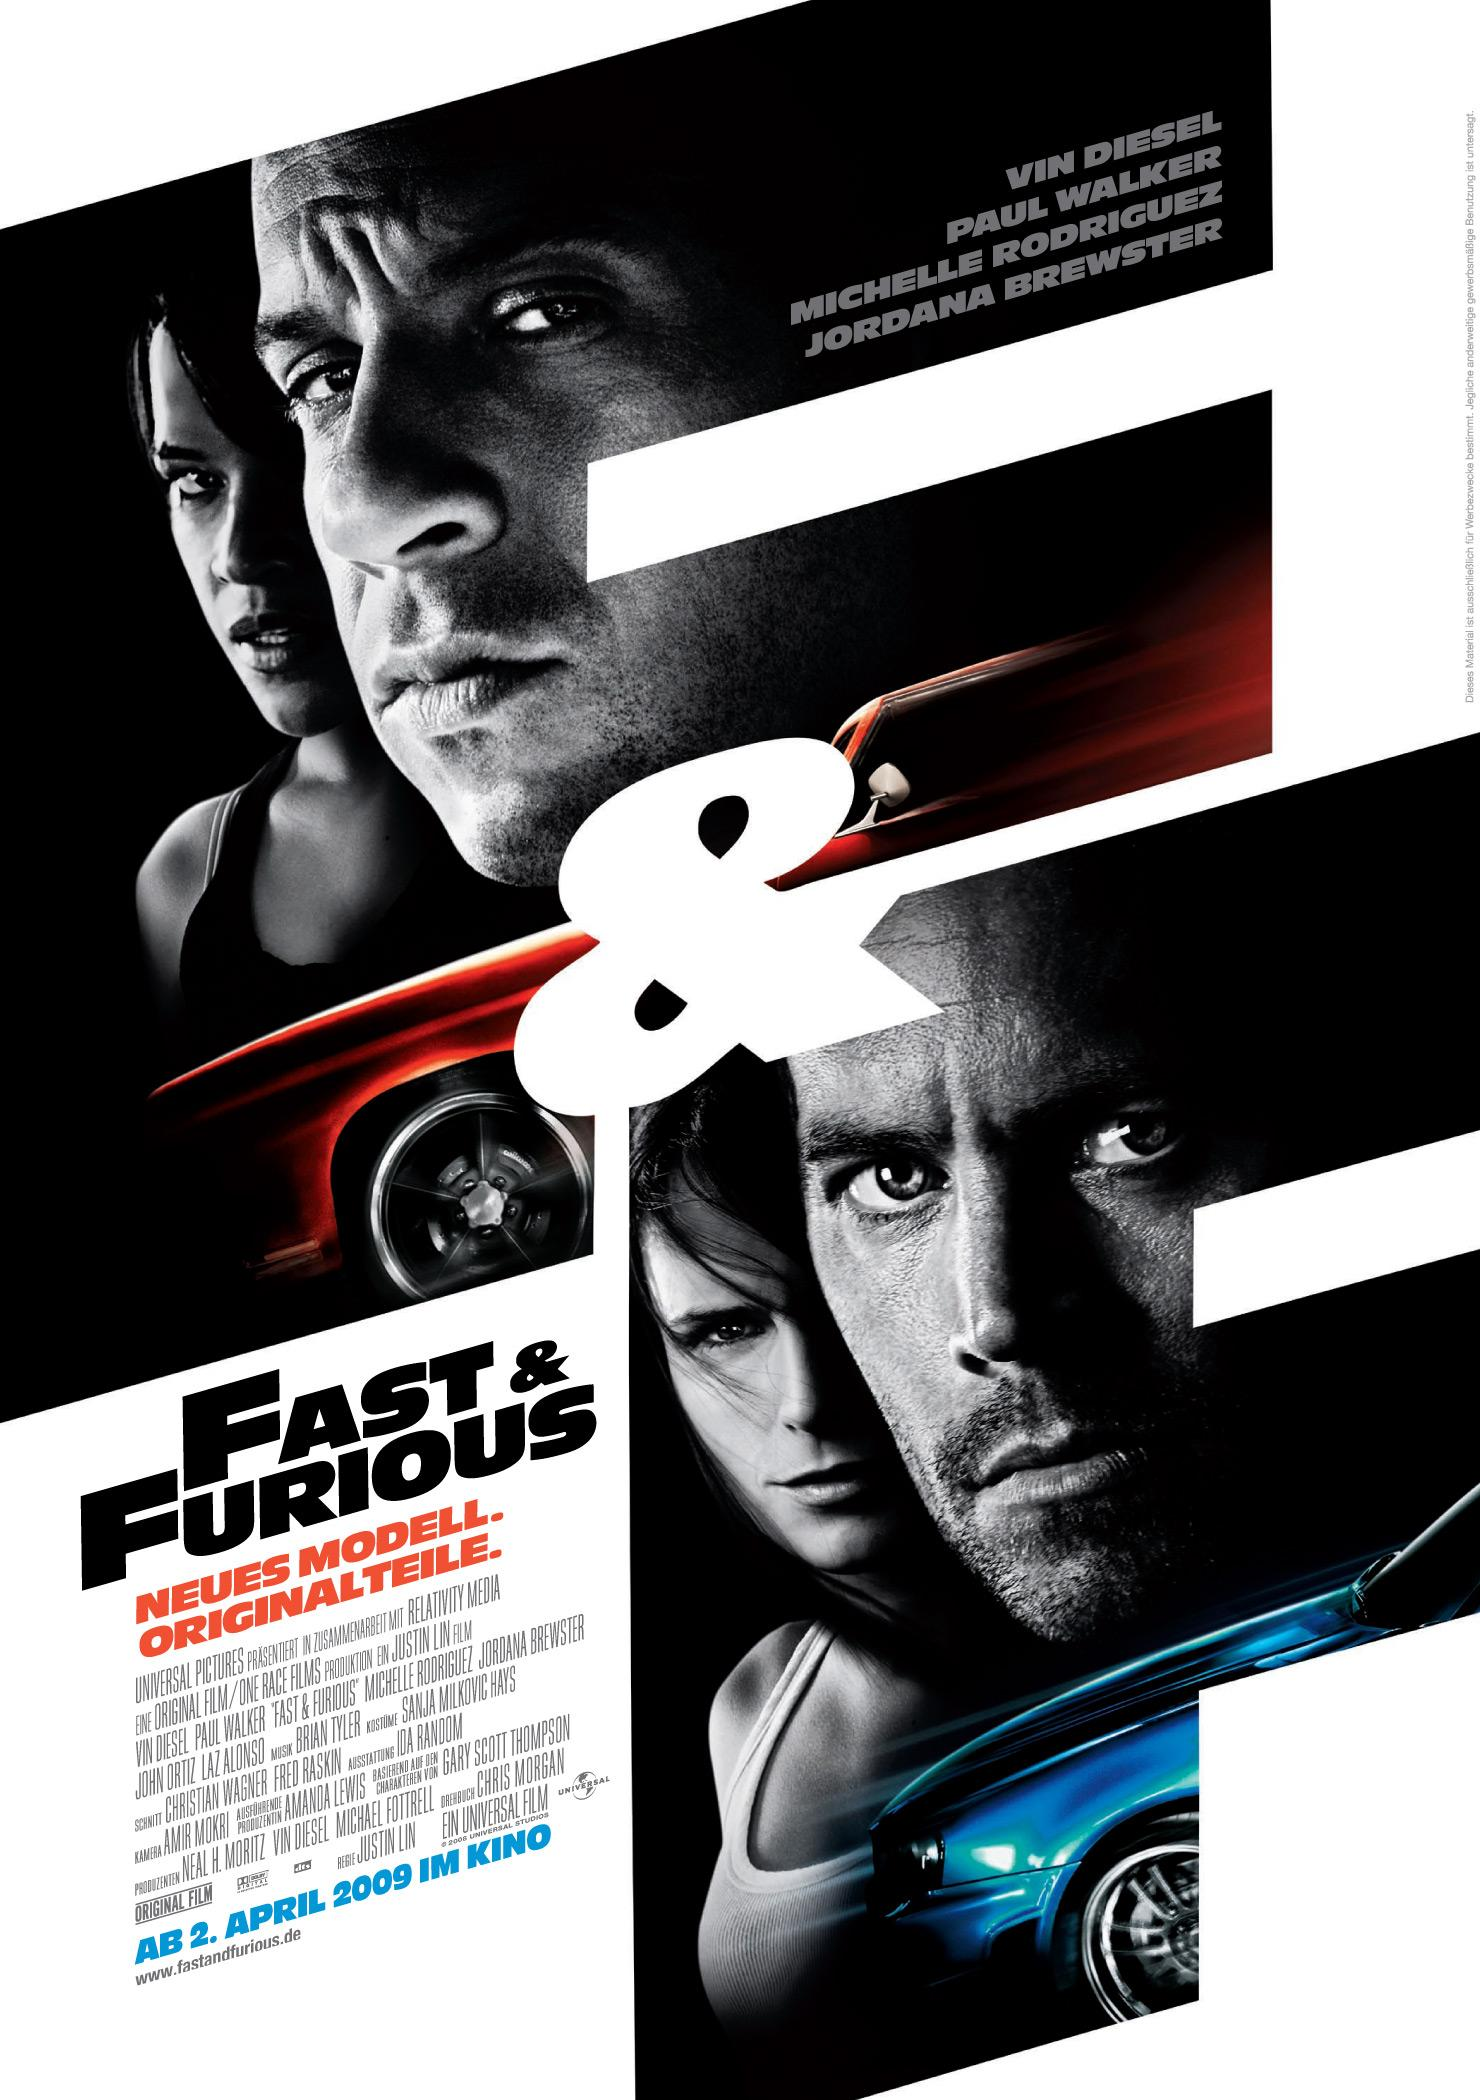 Fast & Furious - Neues Modell. Originalteile. (Poster)